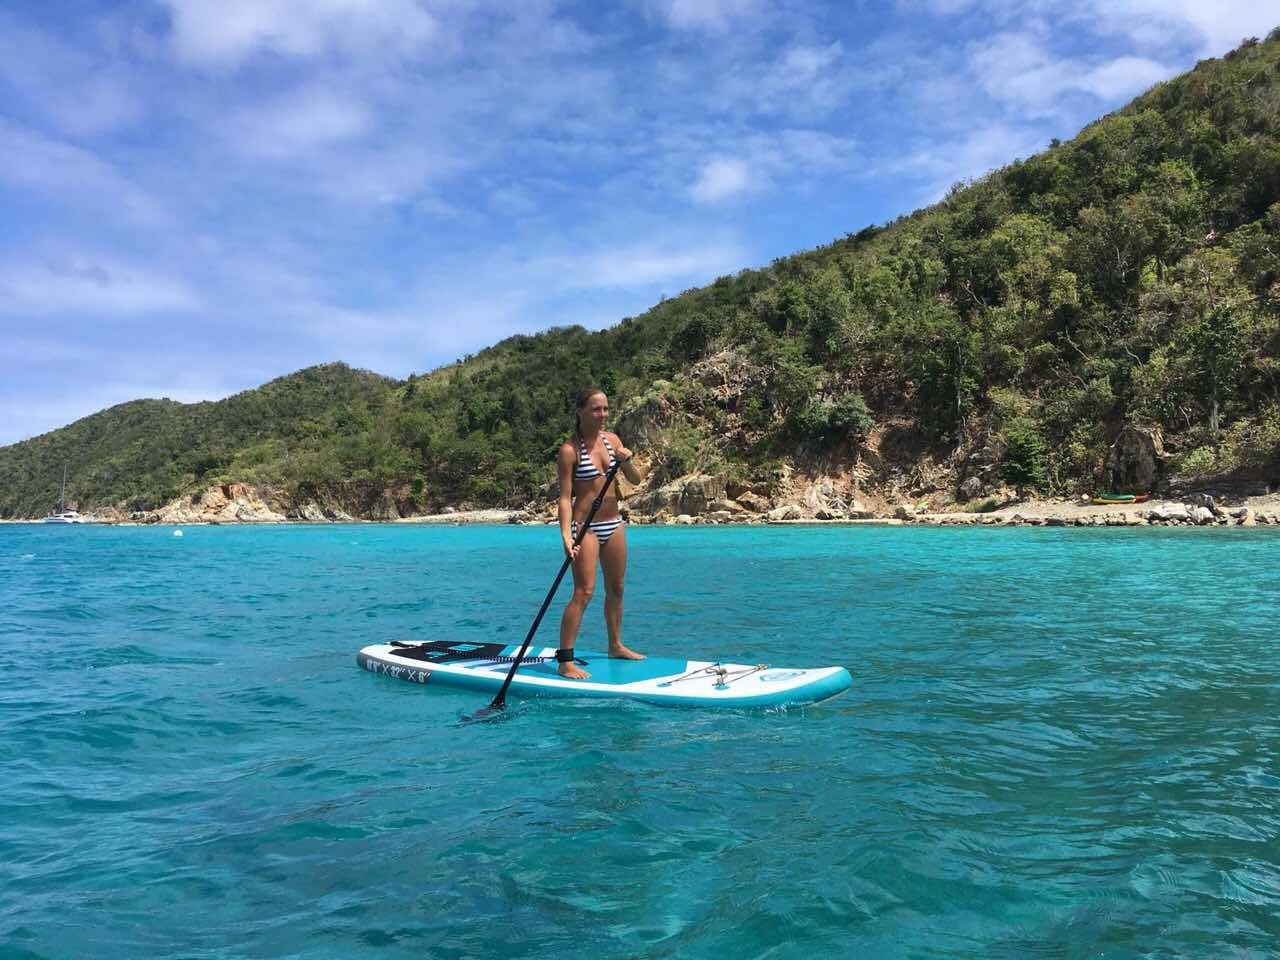 Goosehill rainbow r inflatable paddleboard amazon us 15